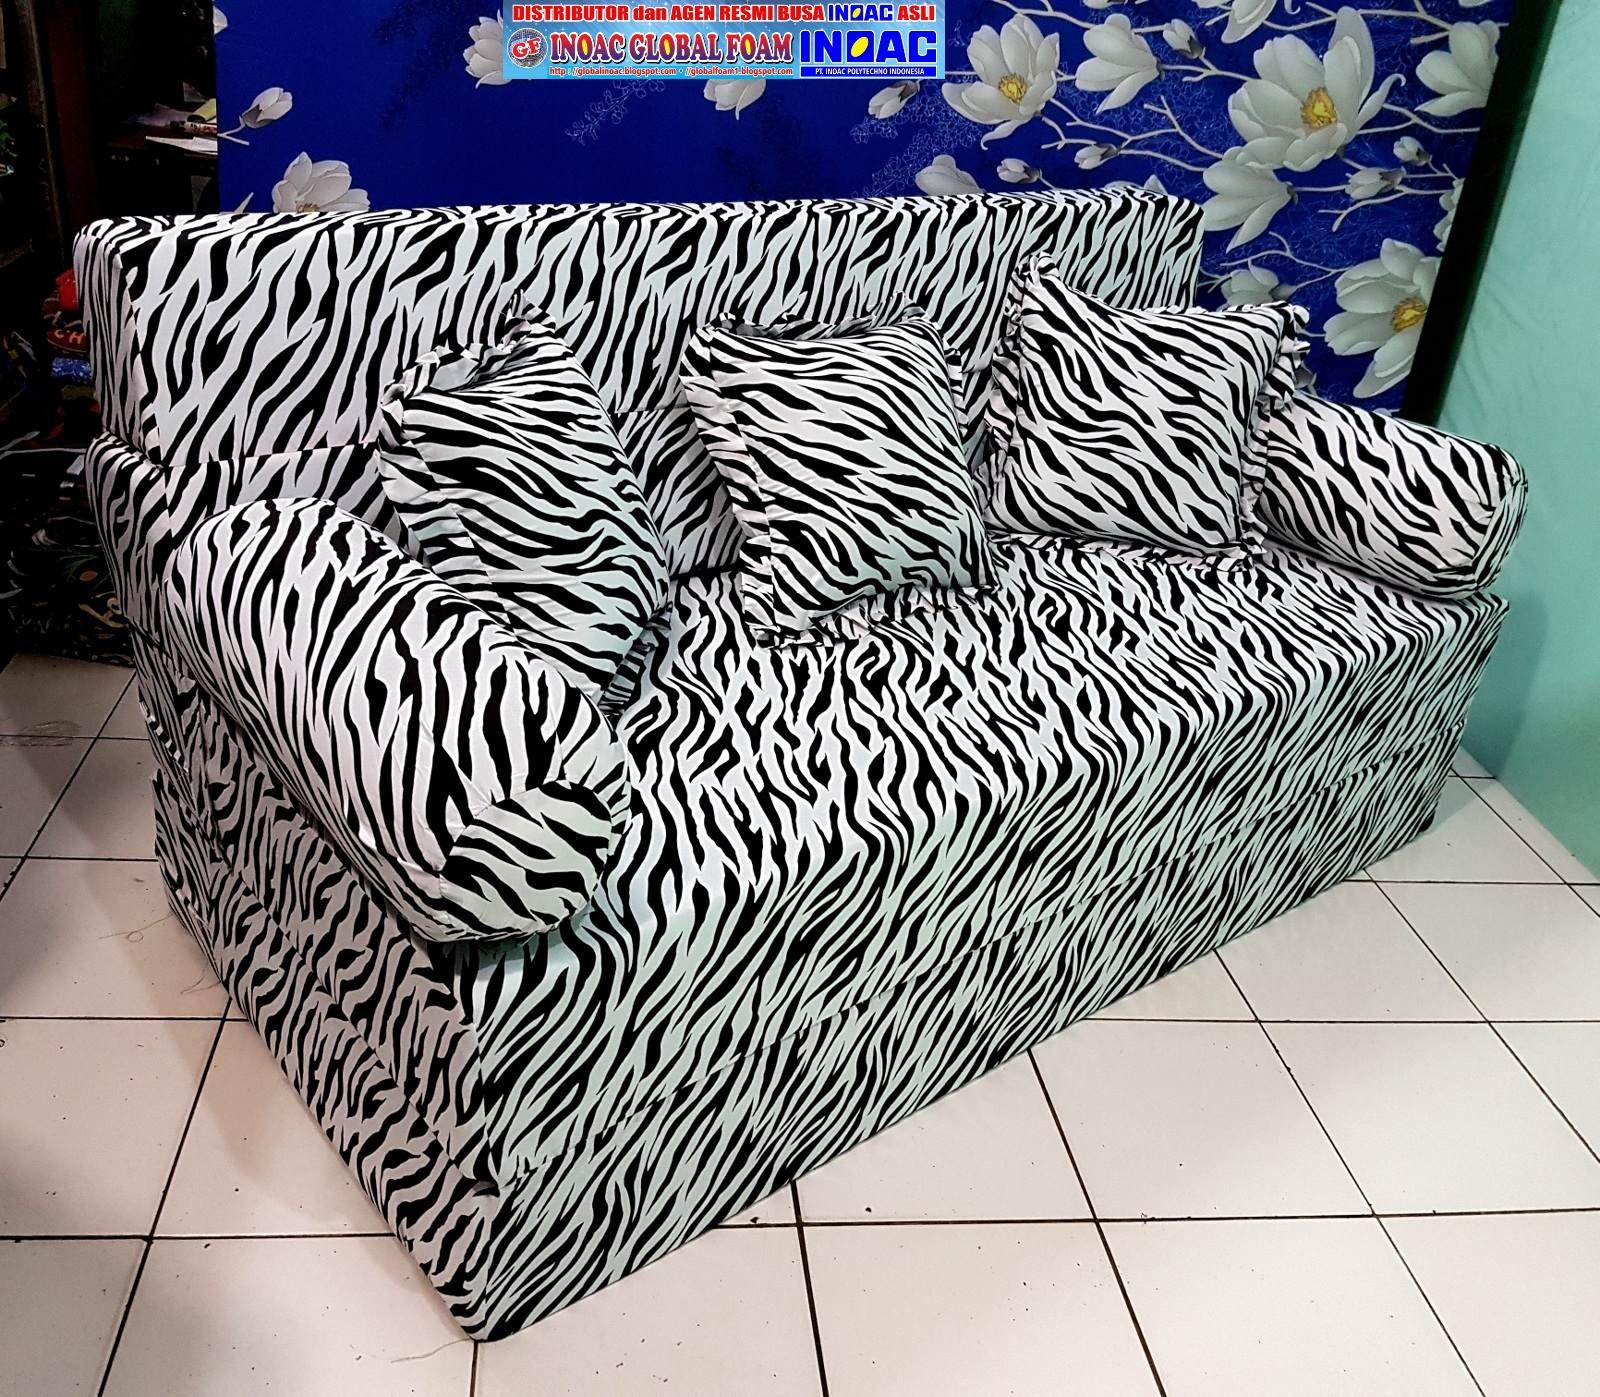 harga sofa bed inoac no 1 leather new jersey kasur 2018 distributor busa asli global